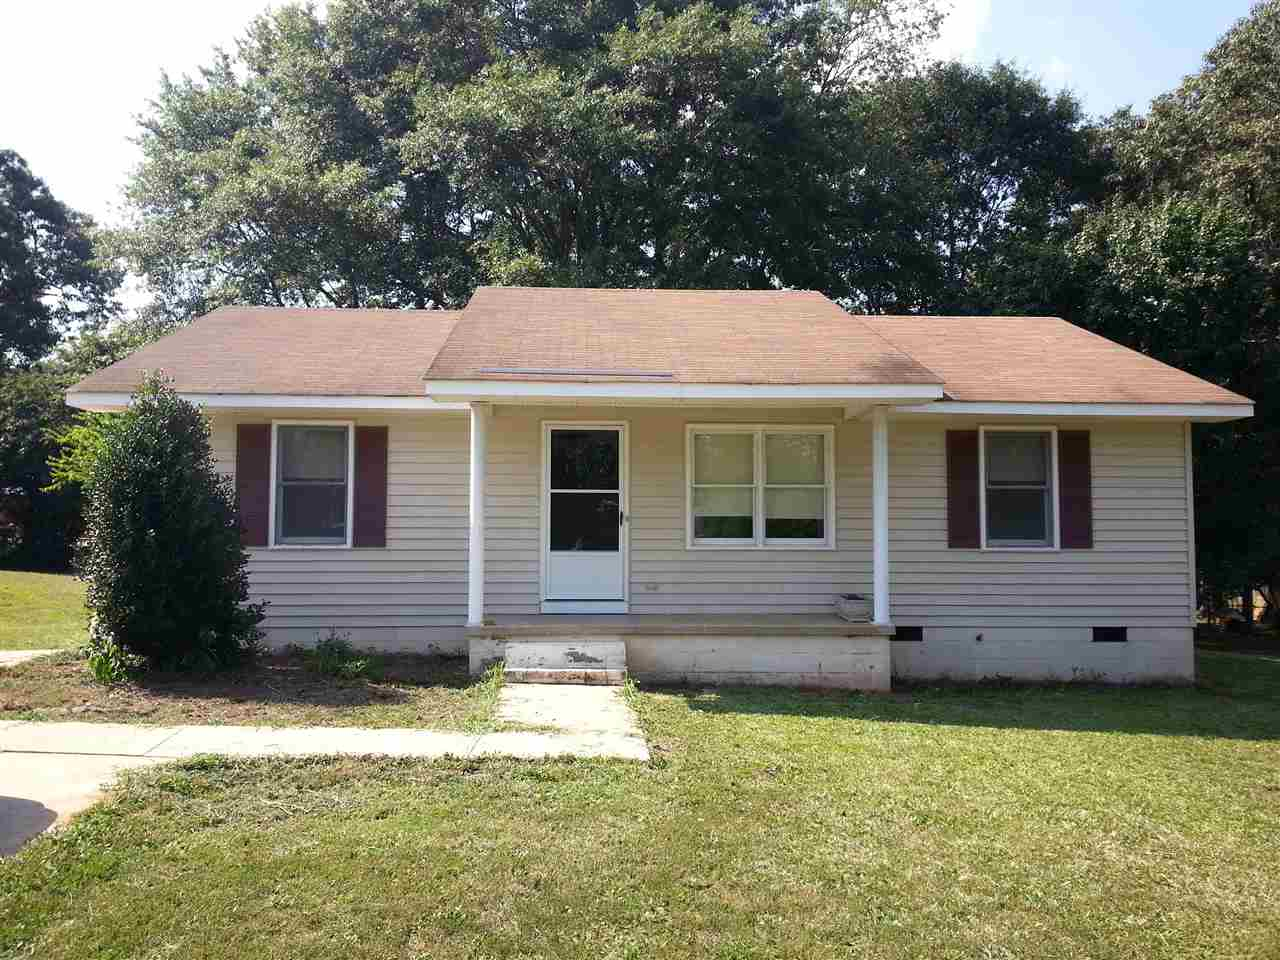 Real Estate for Sale, ListingId: 34057384, Seneca,SC29678